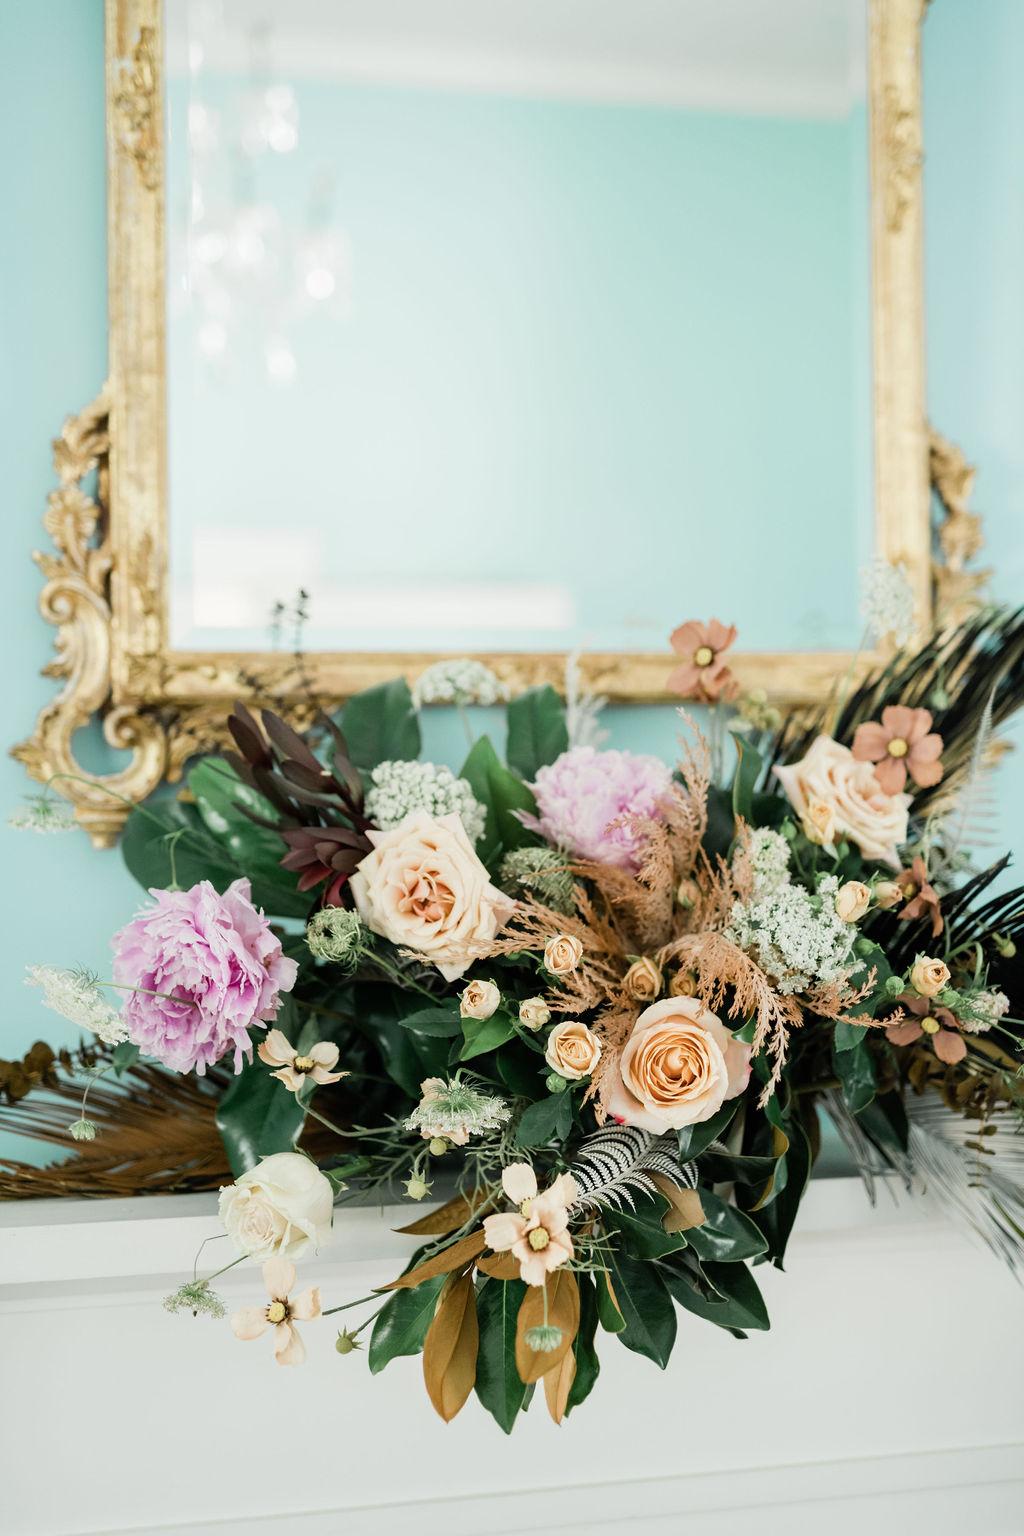 Cali Roots Designs wedding flowers